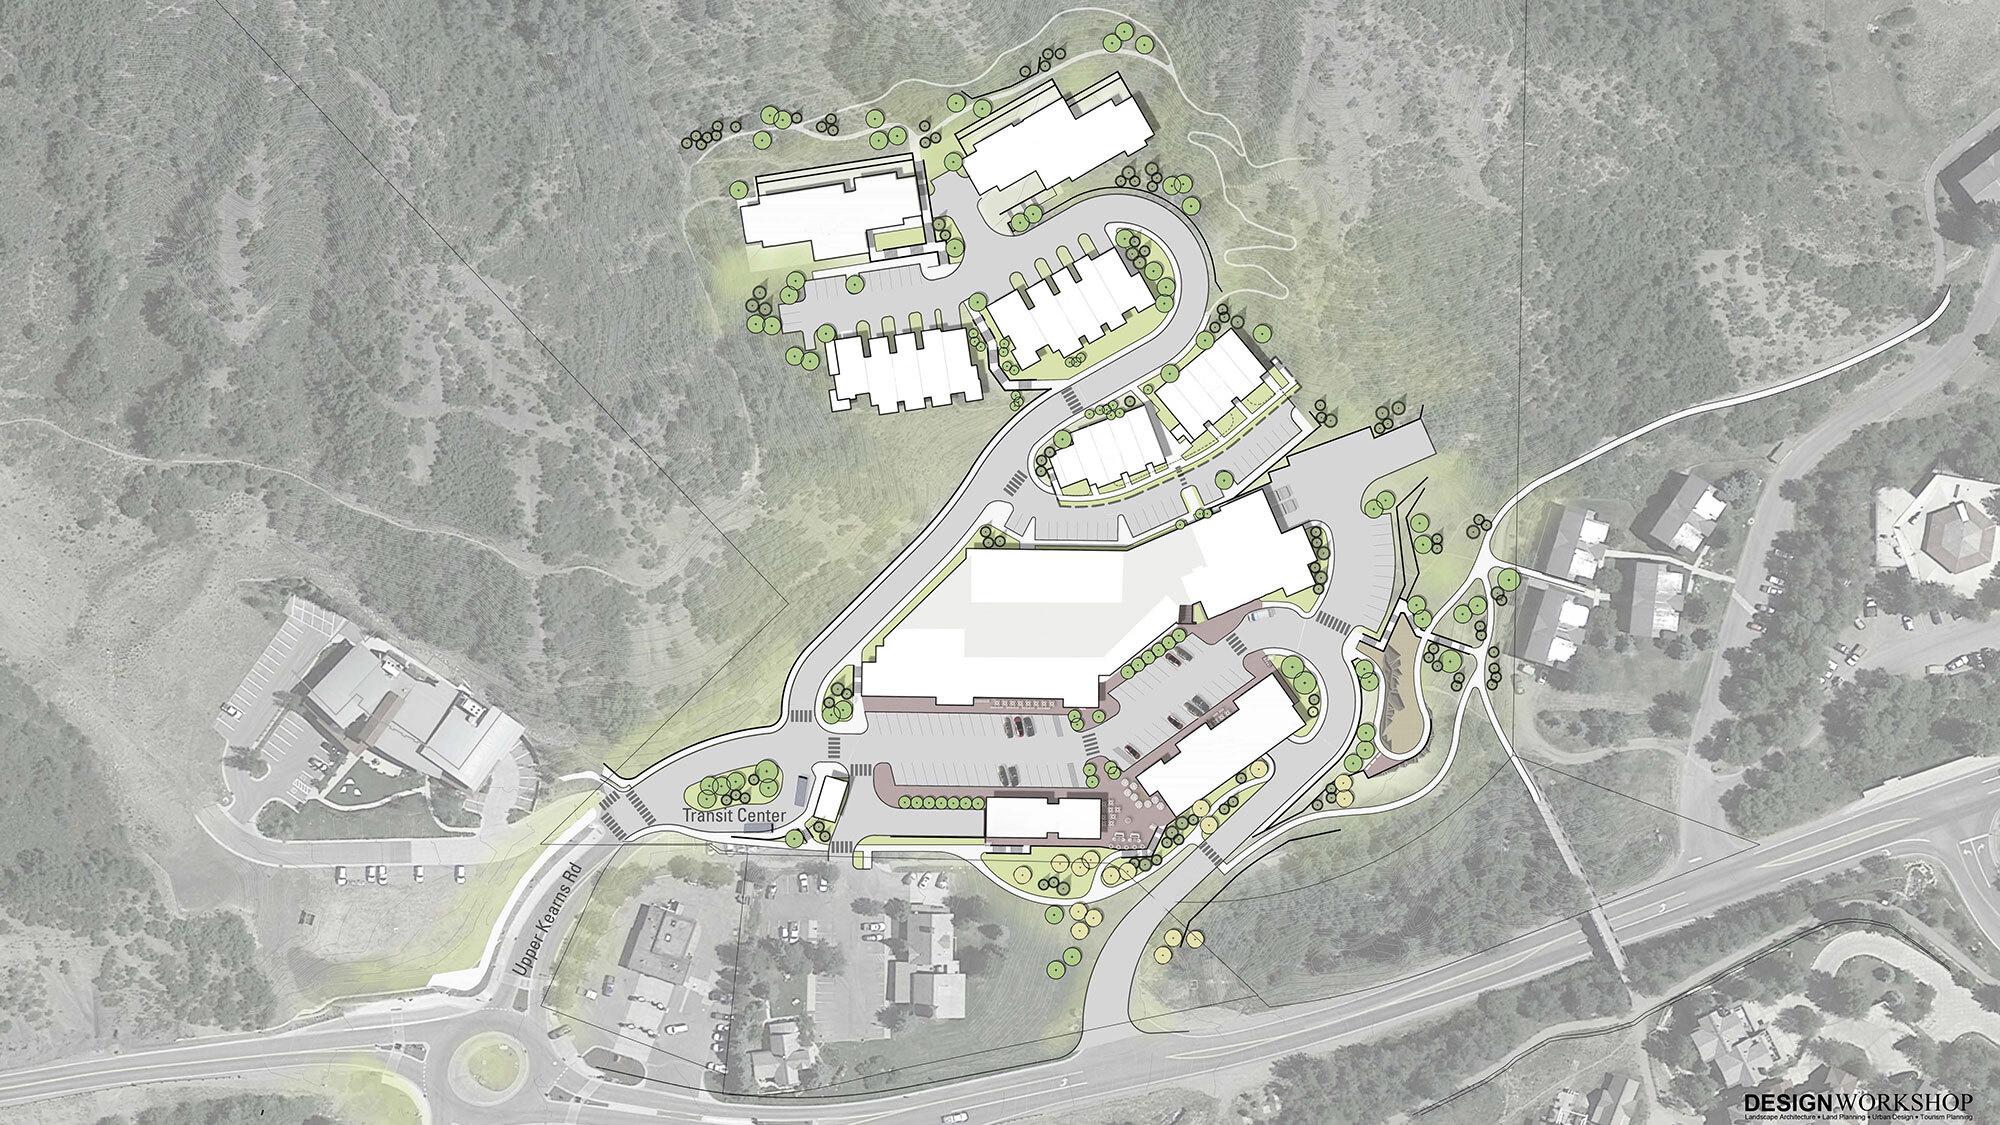 Design Workshop Snowmass Center site plan2